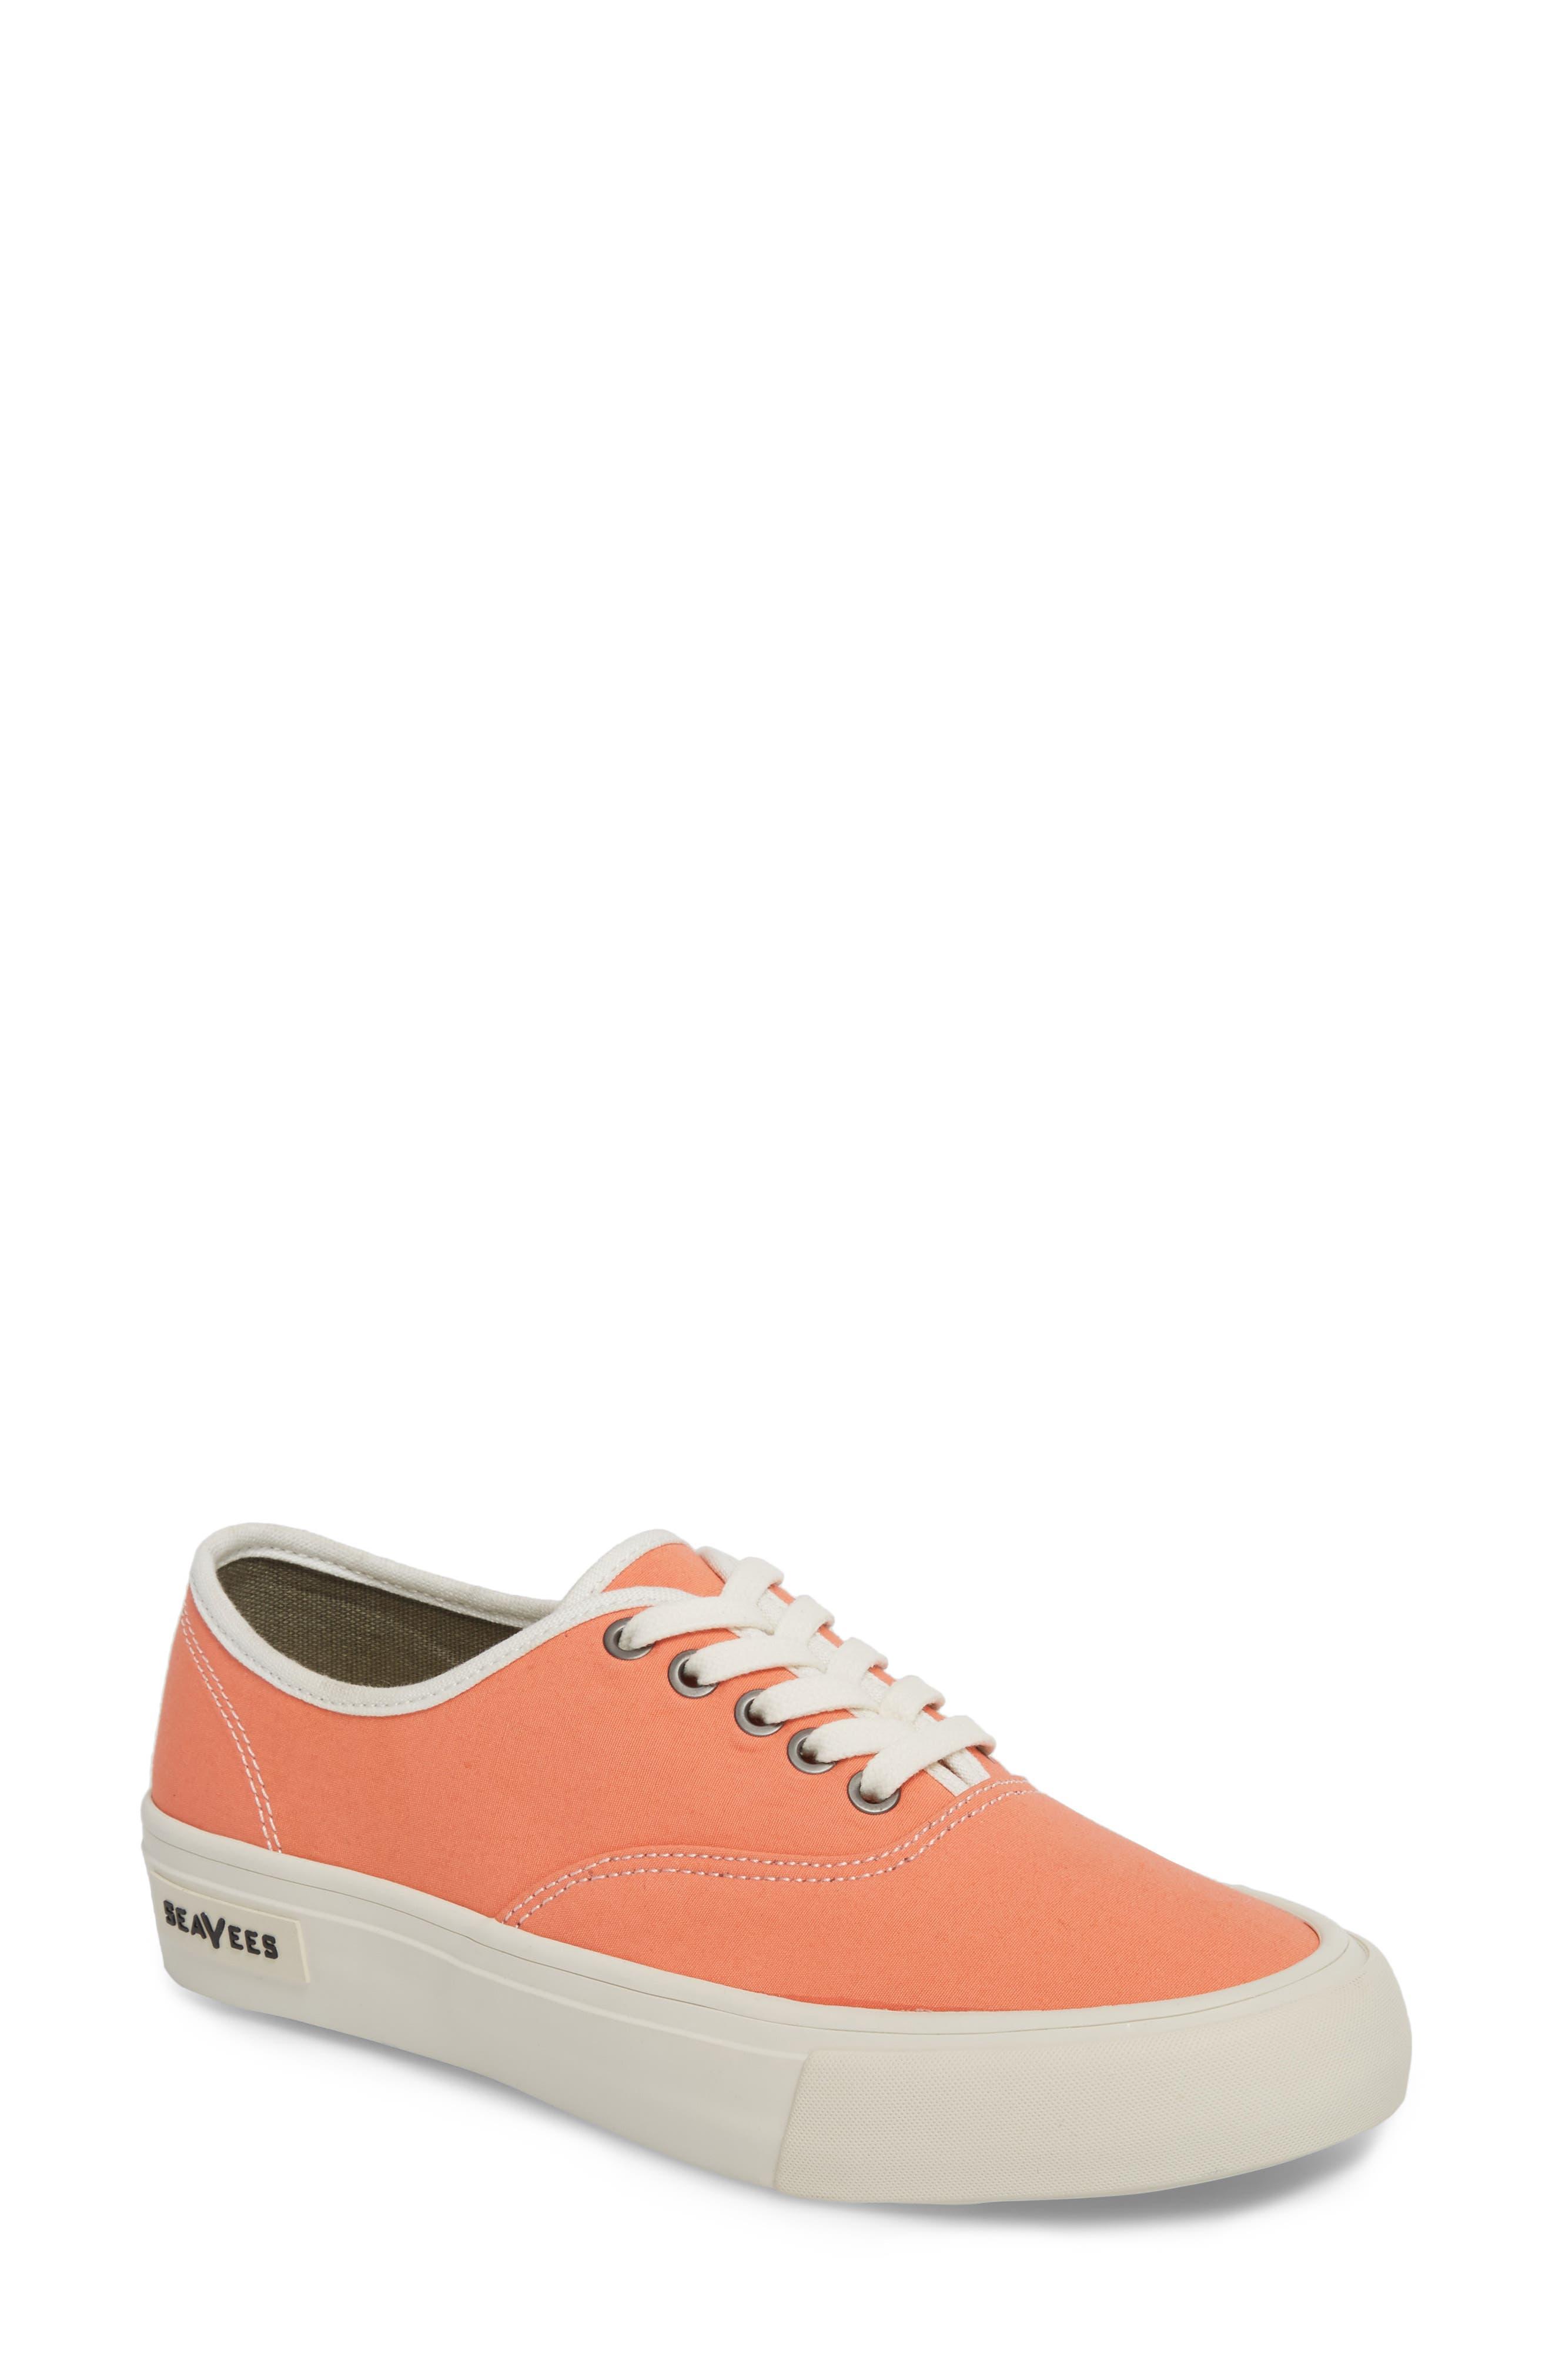 Legend Standard Sneaker,                             Main thumbnail 1, color,                             Coral